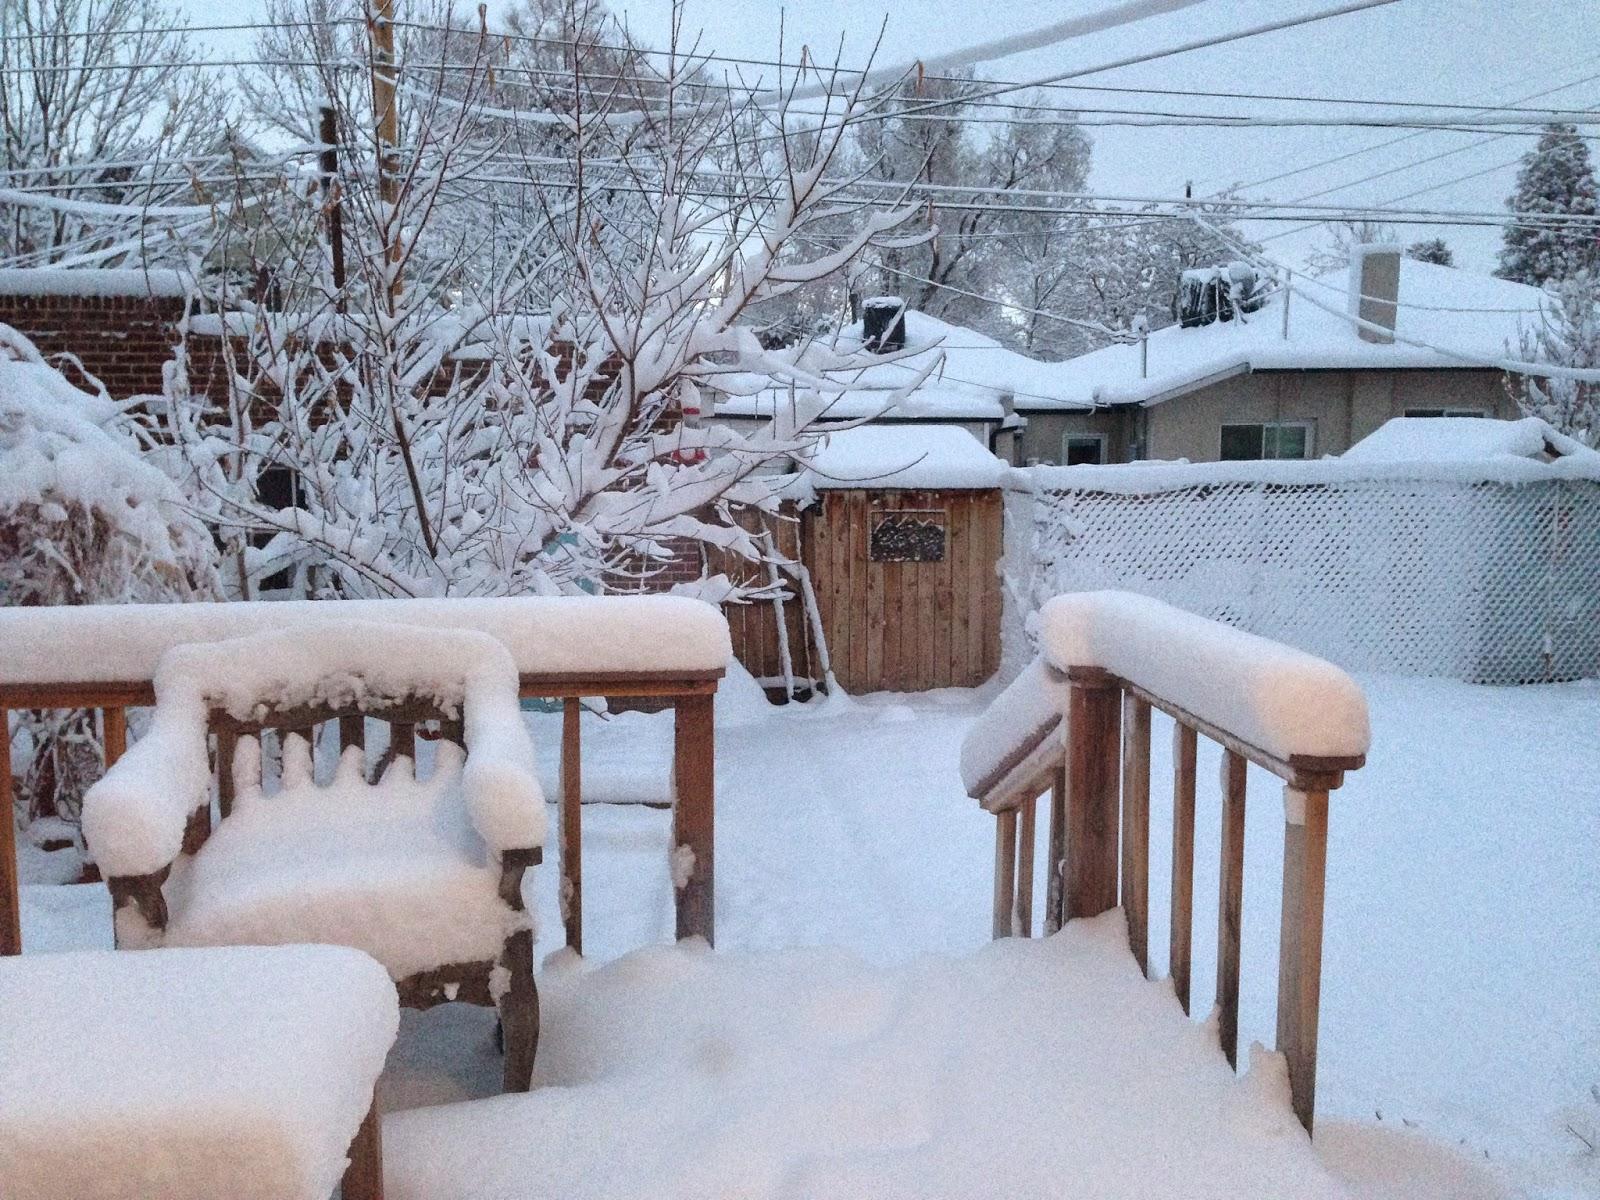 February 1 snowy morning